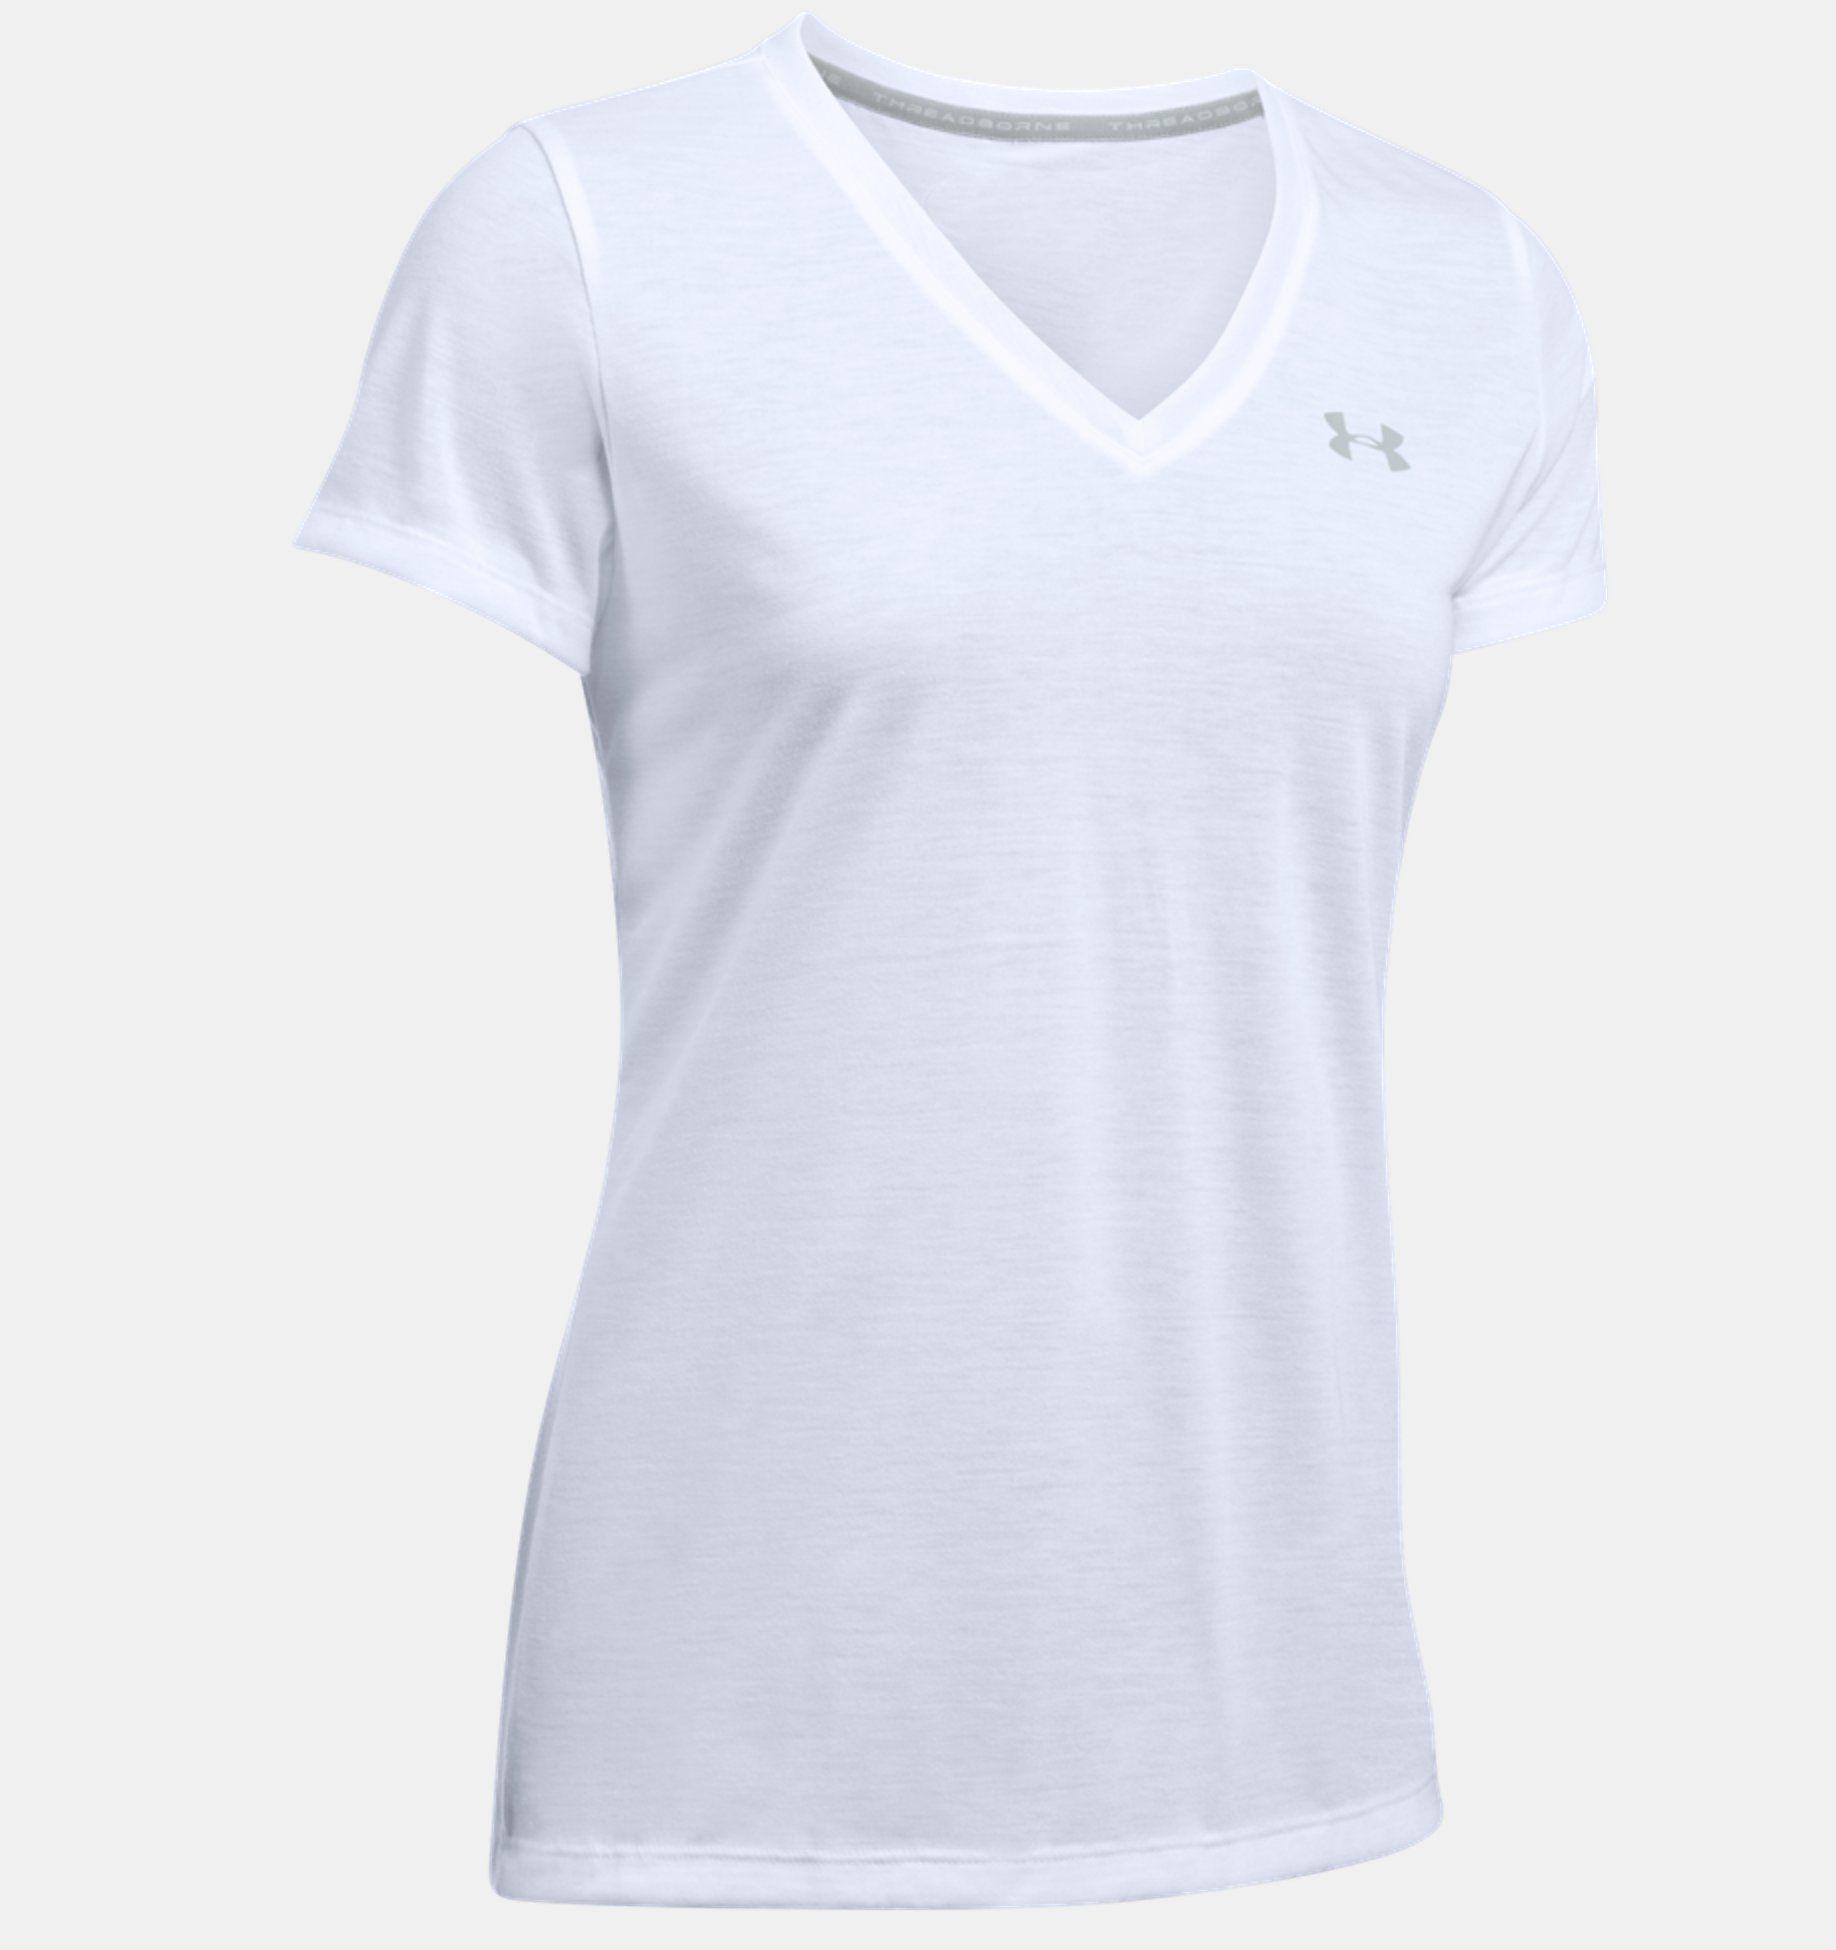 4dfe2edbf53 Camiseta Feminina Under Armour Threadborne Train - BRACIA SHOP  Loja ...